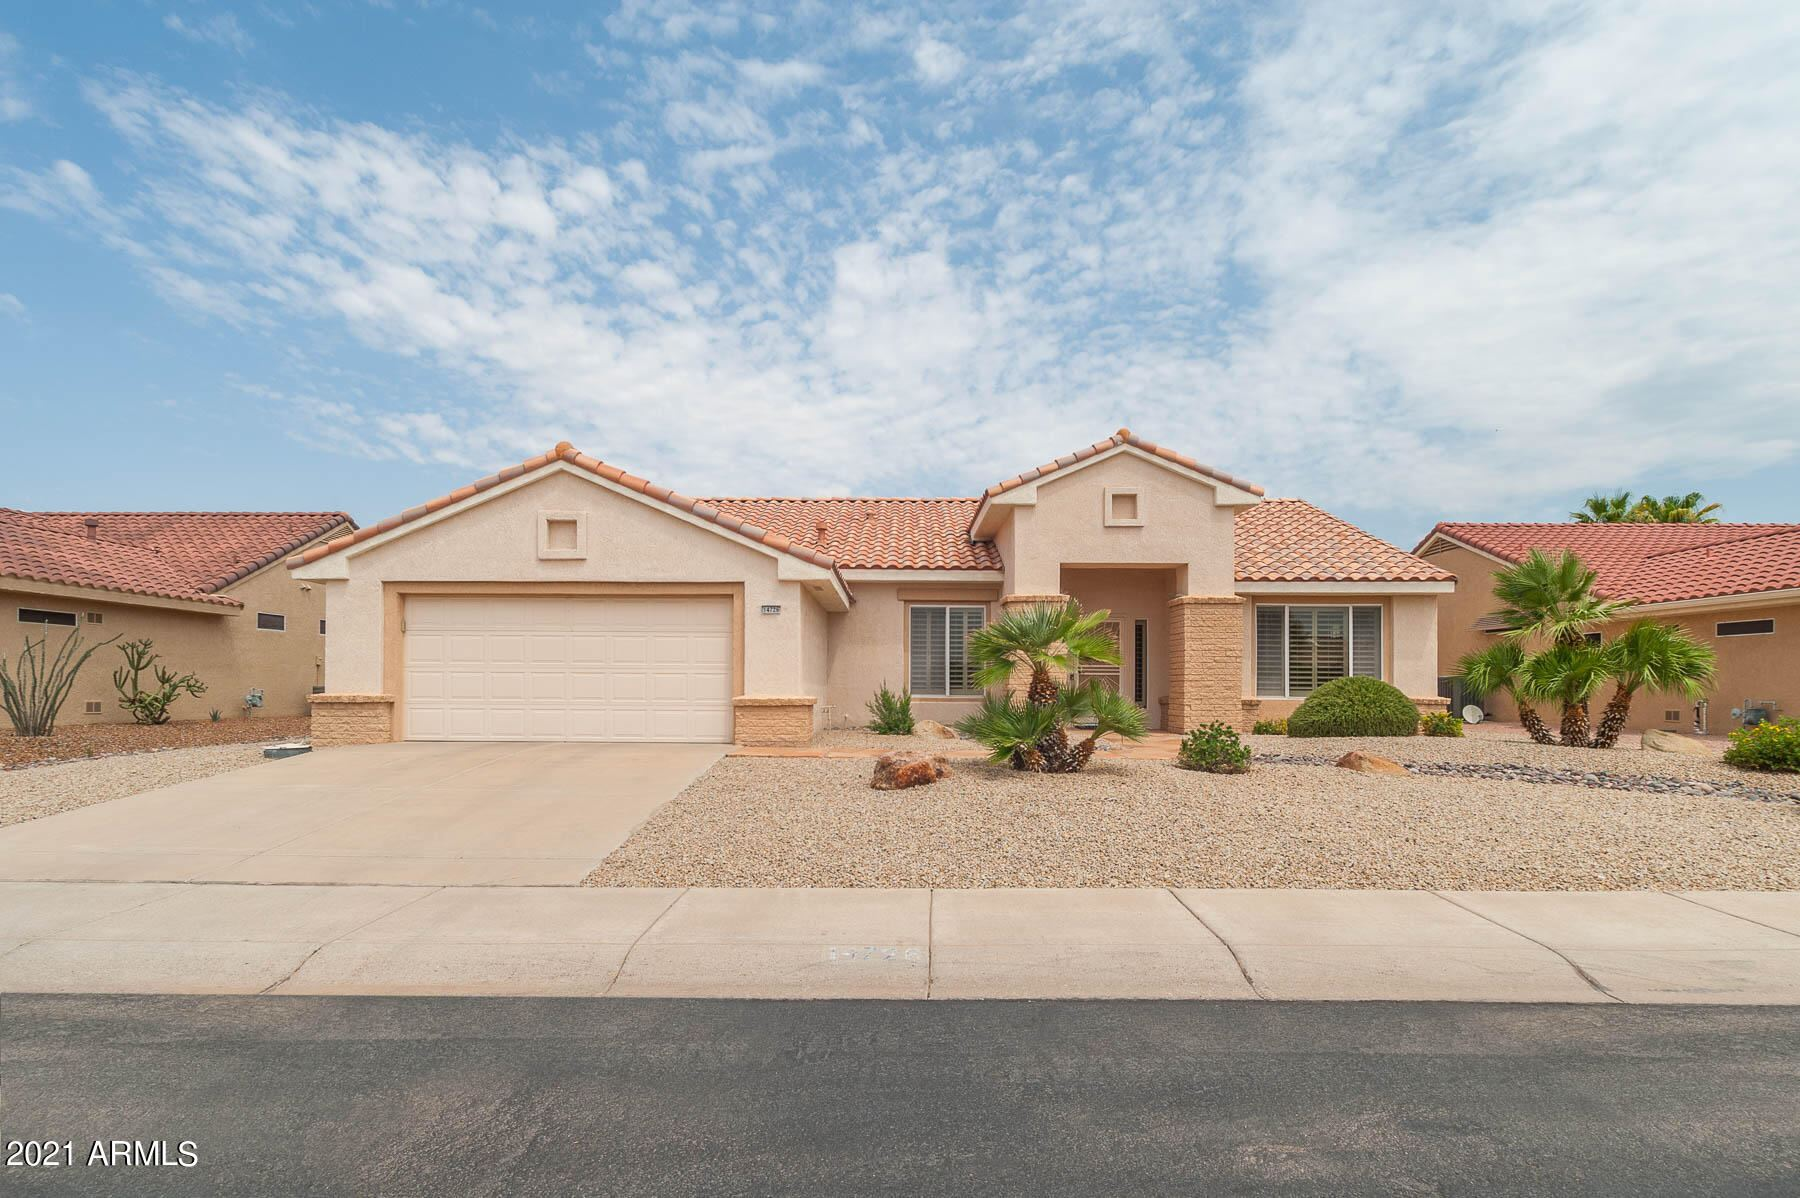 Photo of 14726 W HORIZON Drive, Sun City West, AZ 85375 (MLS # 6265170)